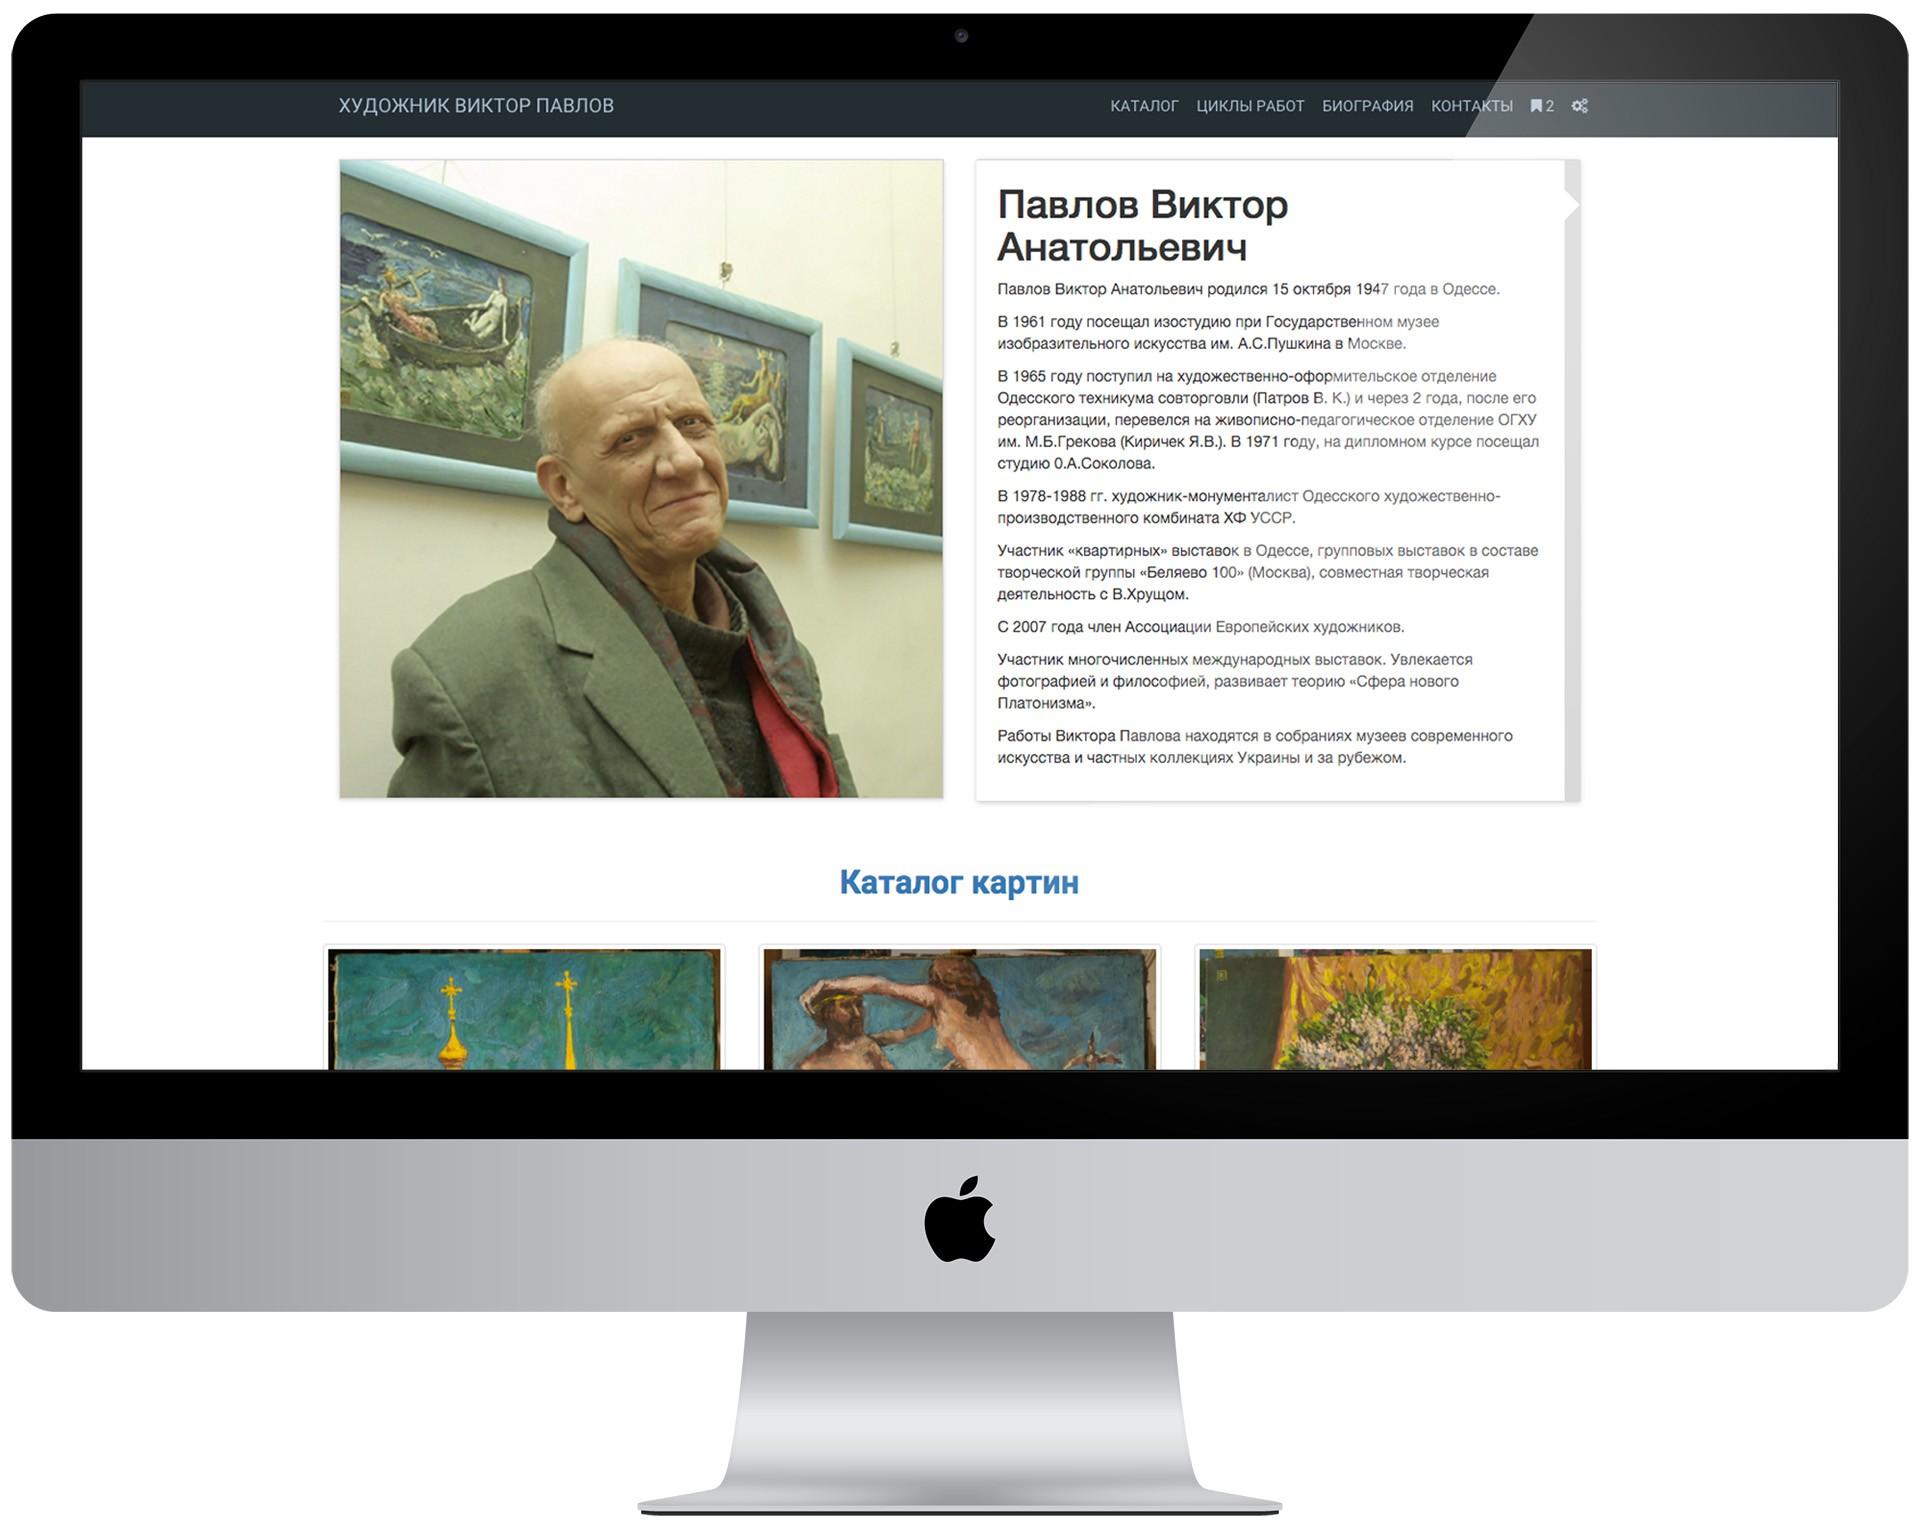 Веб-разработчик Виктор Павлов - Каталог картин